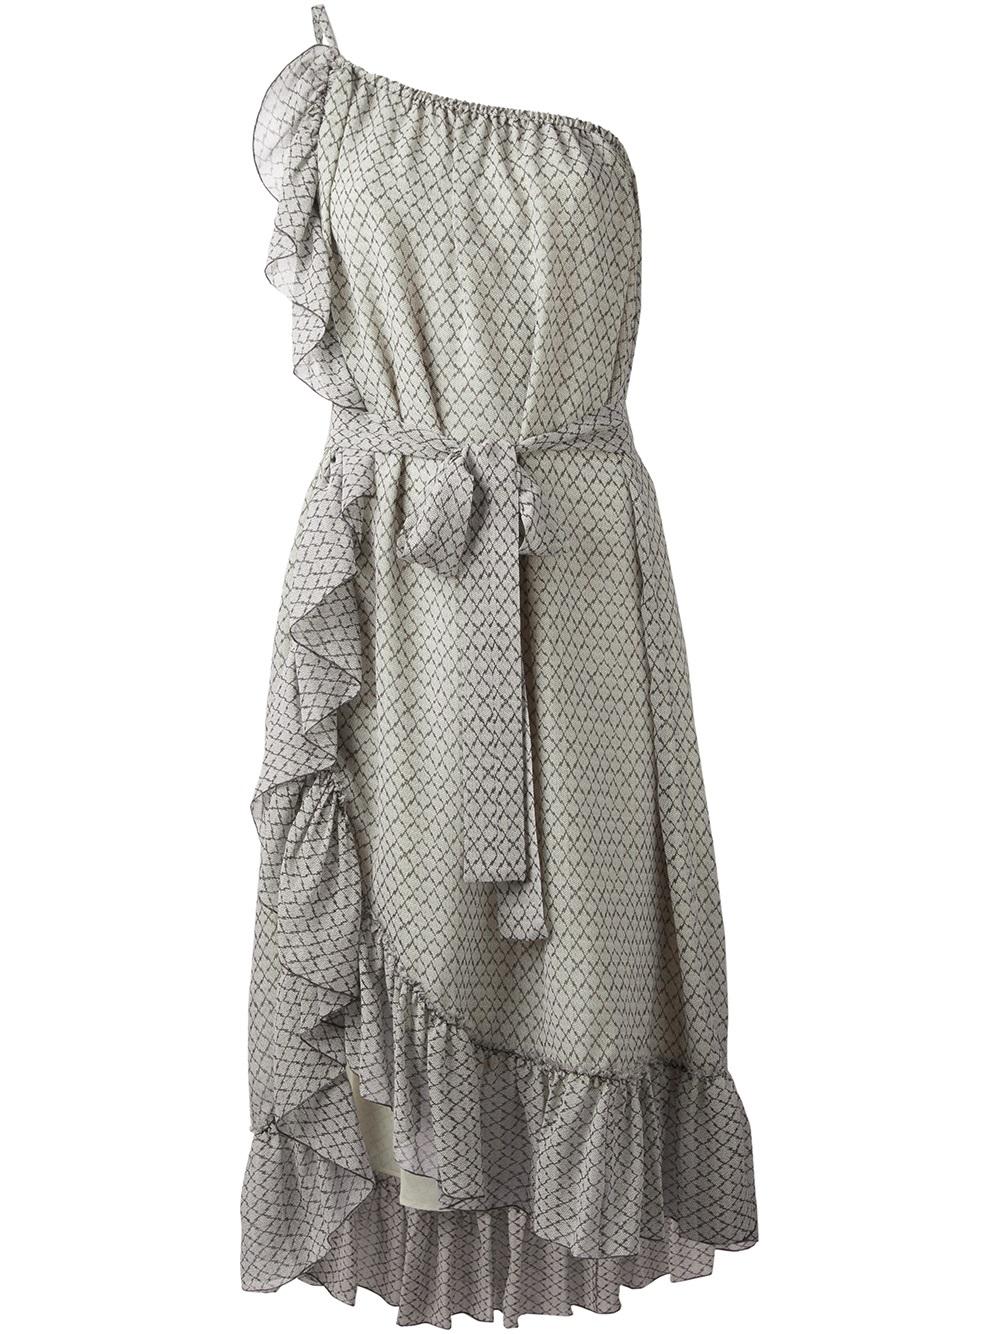 Isabel marant aiden dress in gray white lyst for Isabel marant shirt dress